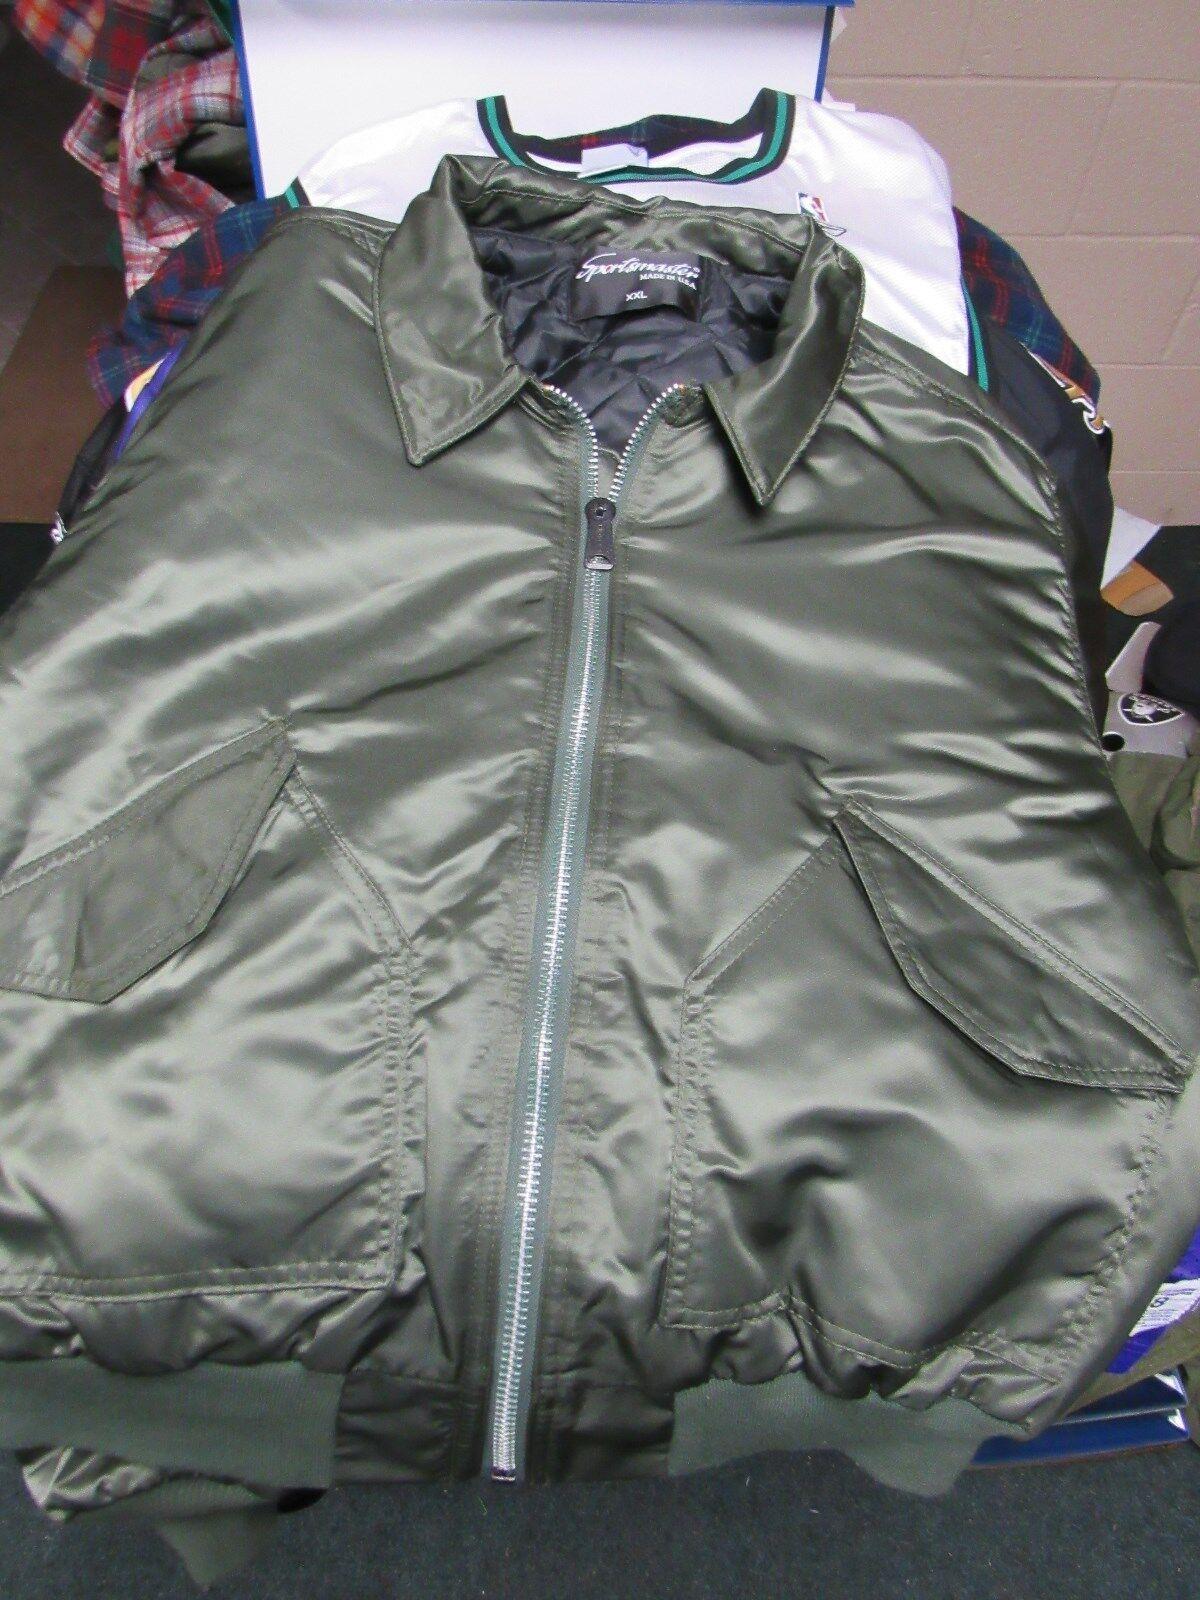 SPORTSMASTER vert Bomber Veste Style Col homme taille 2XL nylon très bon état Usa Made